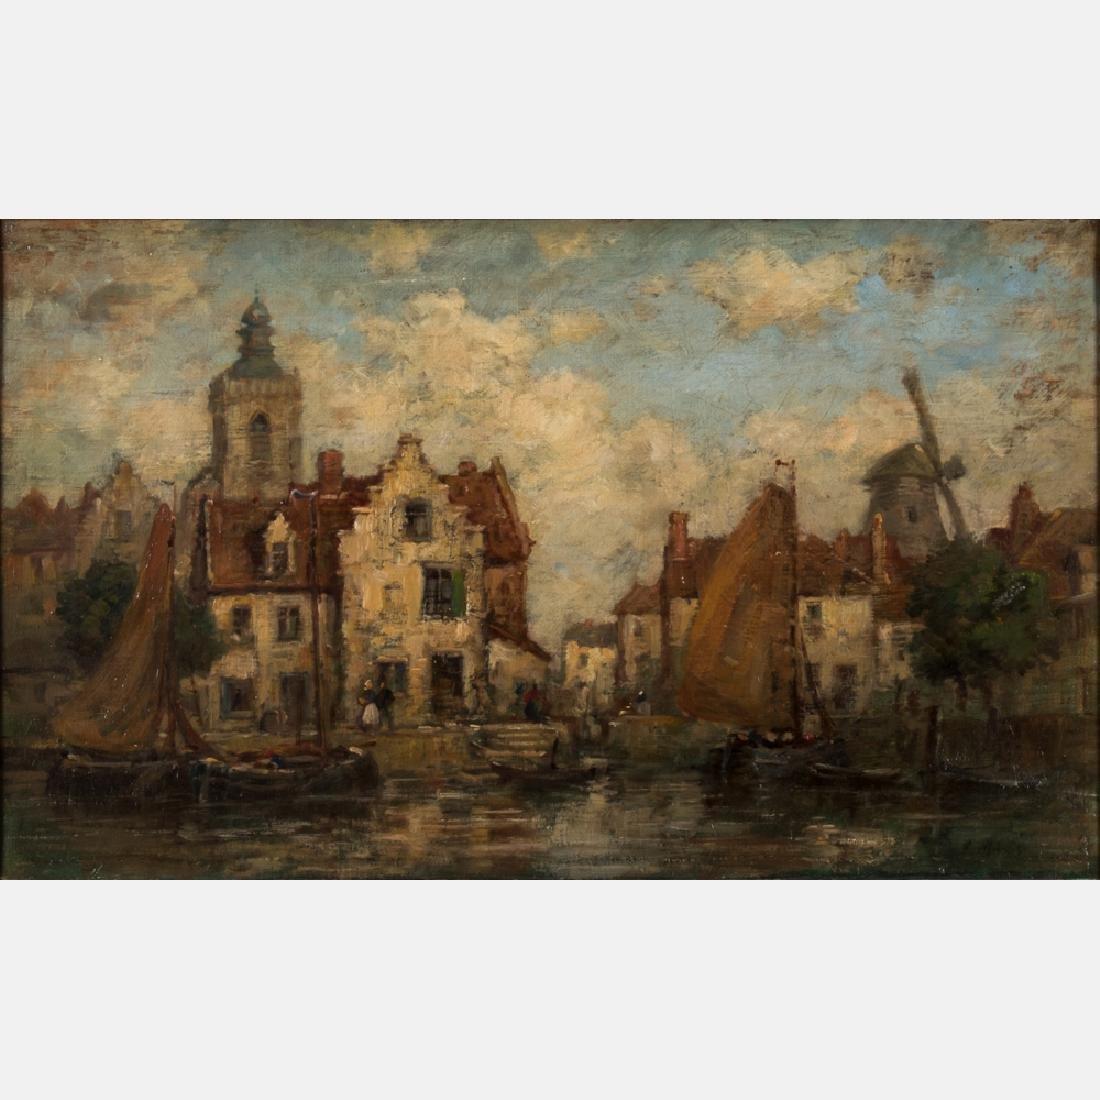 Jacob Henricus Maris (1837-1899) Dutch Canal Scene, Oil